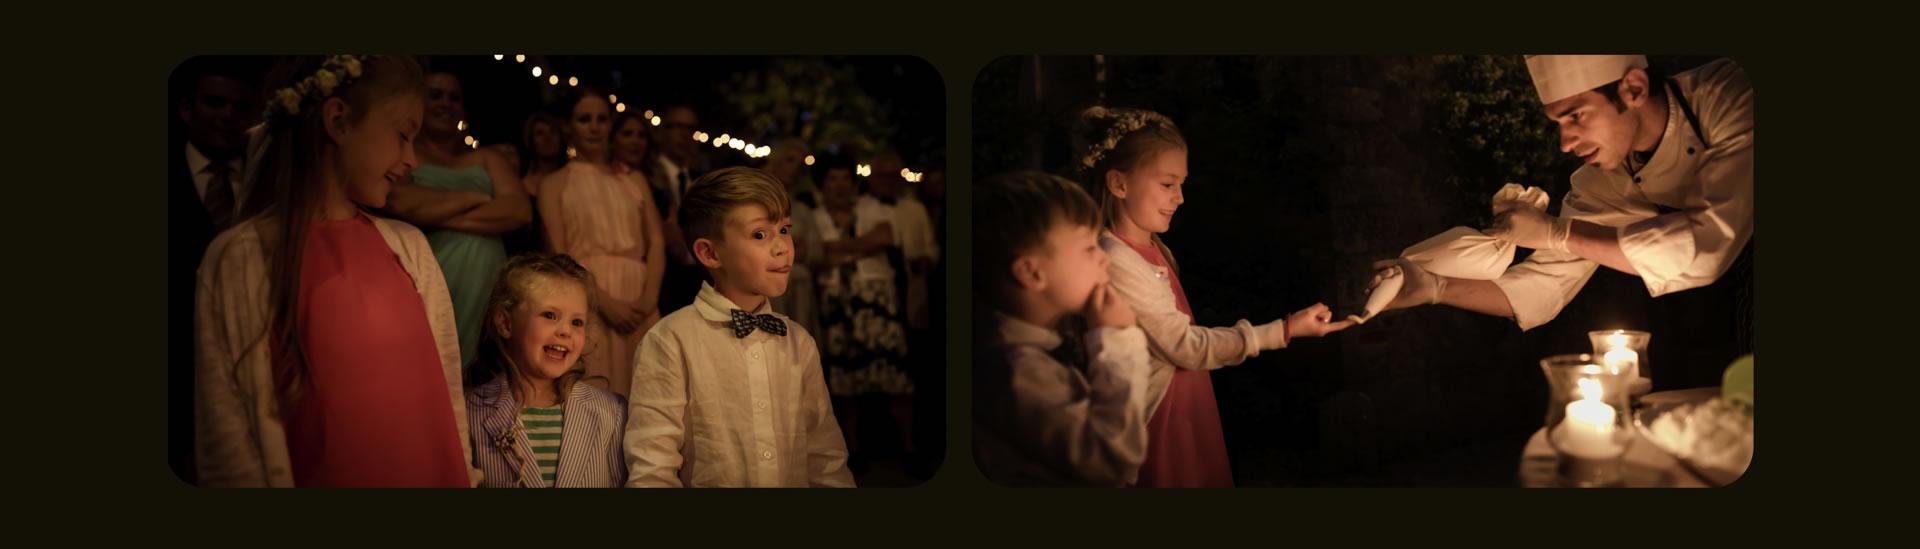 borgo-stomennano-david-bastianoni-photographer-00044 - 44 :: Wedding at Borgo Stomennano // WPPI 2018 // Our love is here to stay :: Luxury wedding photography - 43 :: borgo-stomennano-david-bastianoni-photographer-00044 - 44